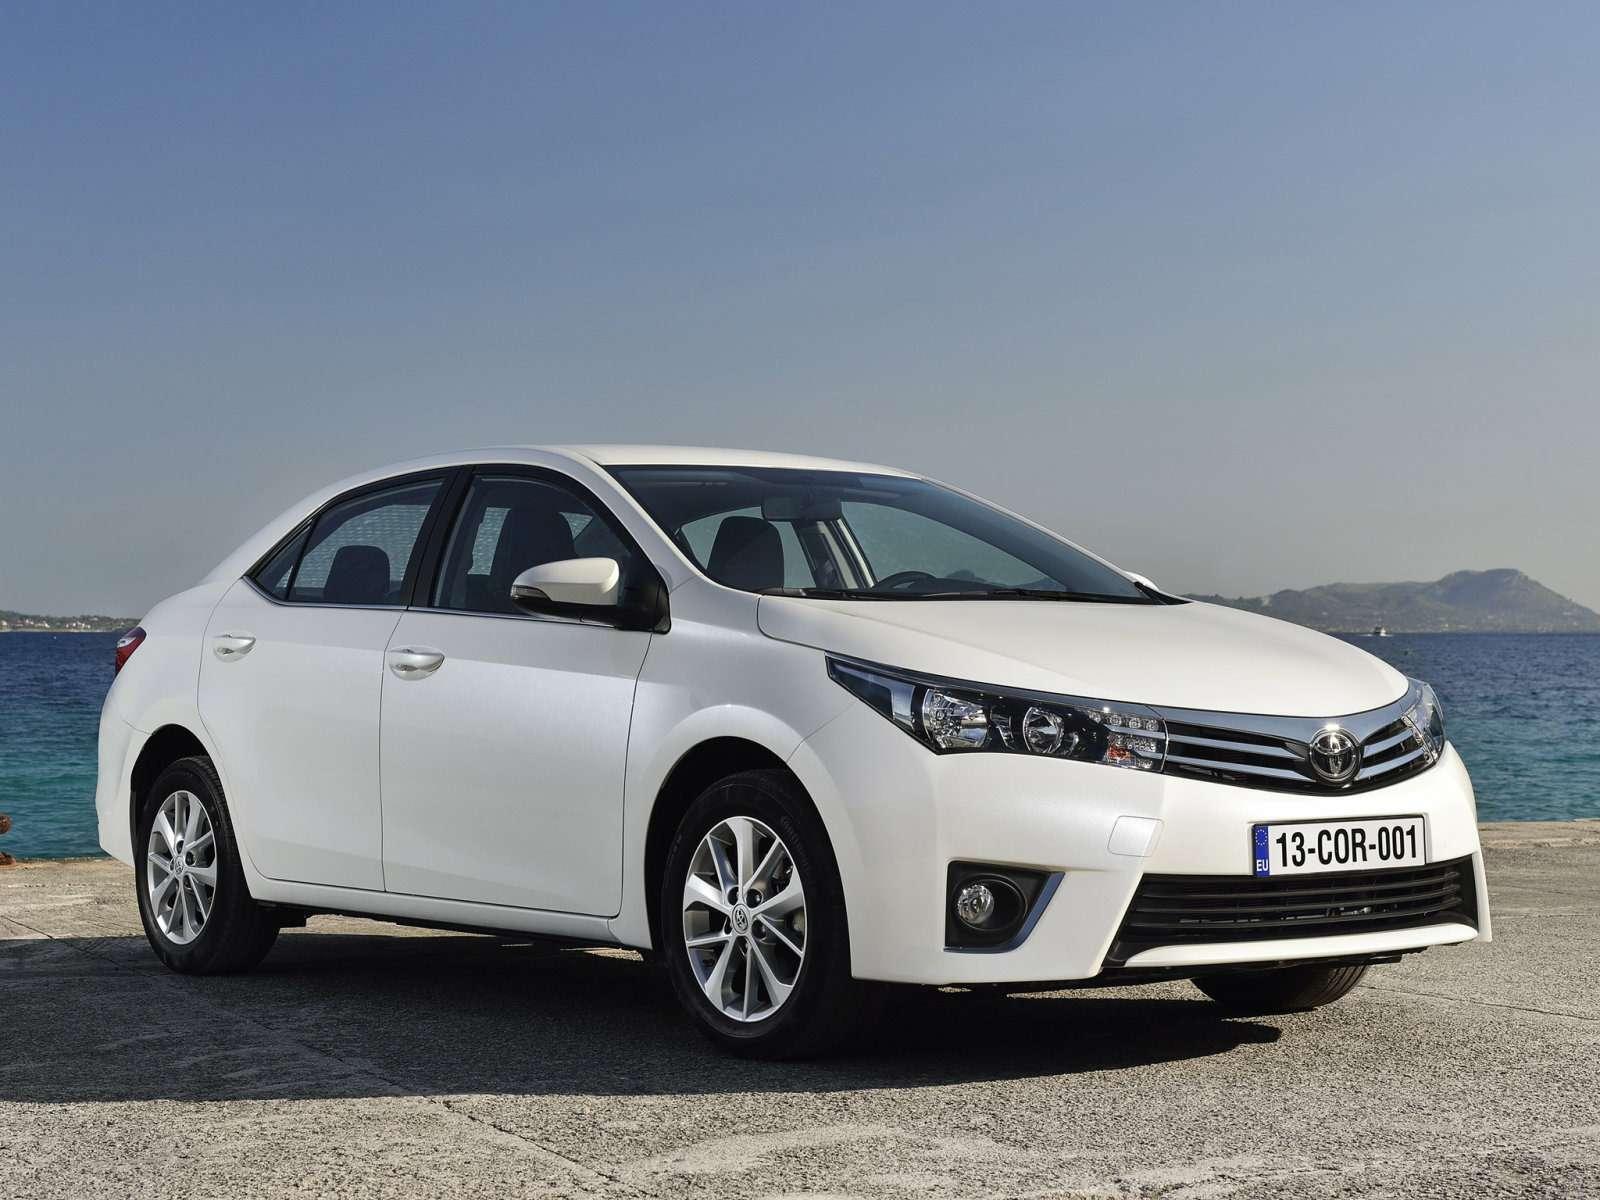 Toyota_Corolla_Sedan_2013